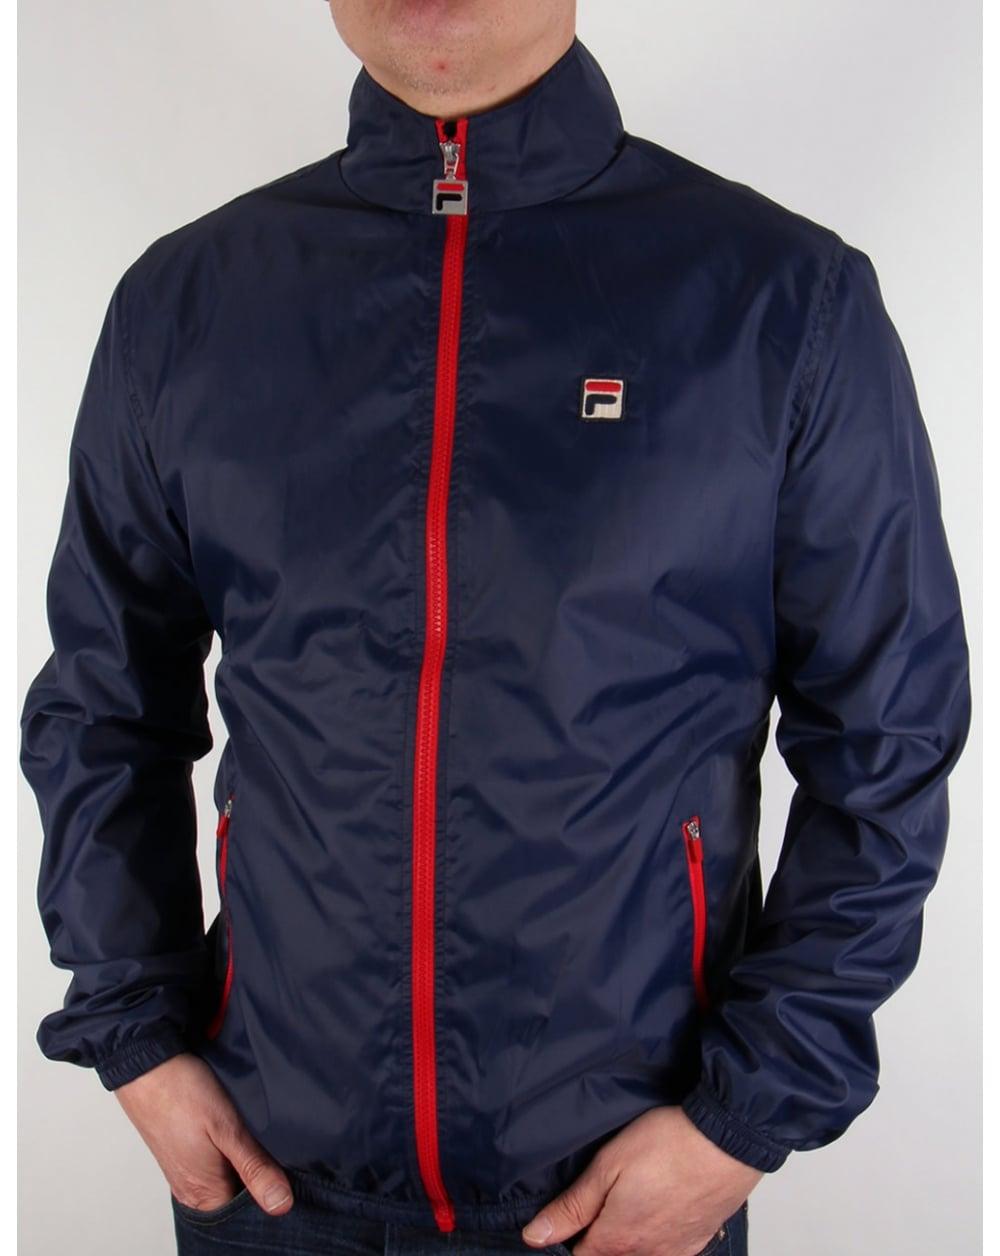 fila navy blue jacket. fila vintage funnel rain jacket navy blue